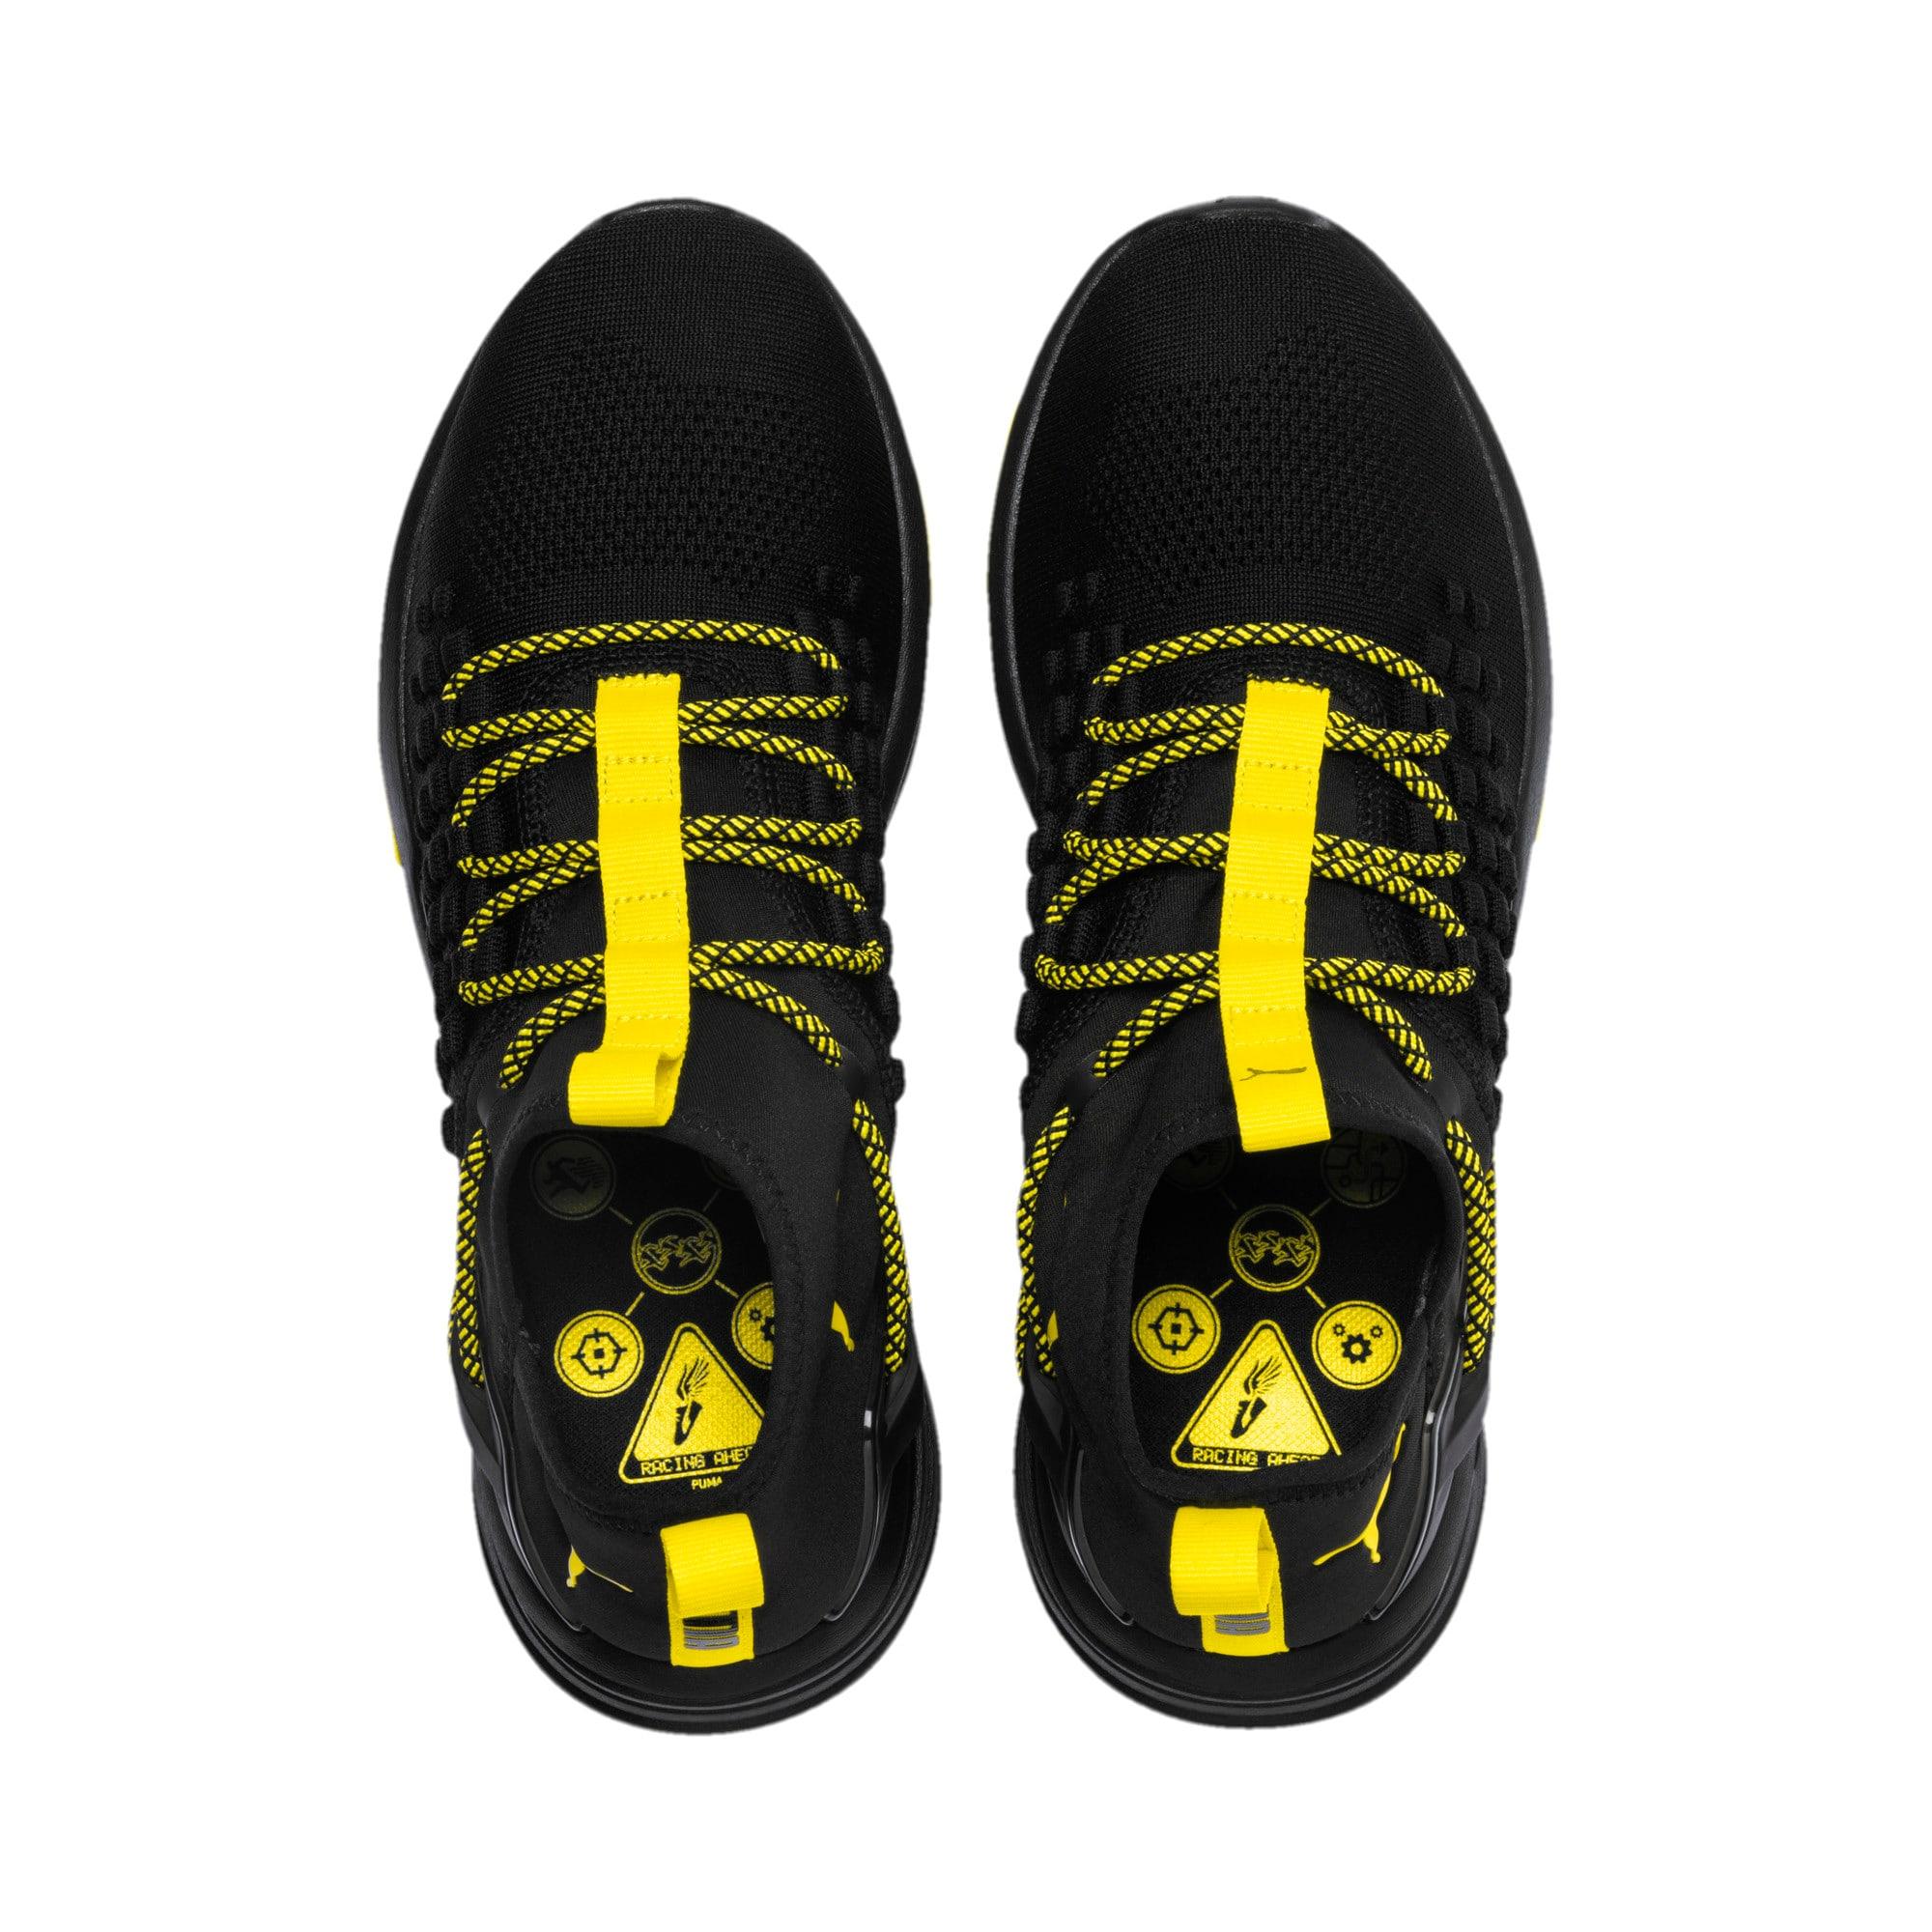 Thumbnail 6 of Mantra Caution Men's Training Shoes, Puma Black-Blazing Yellow, medium